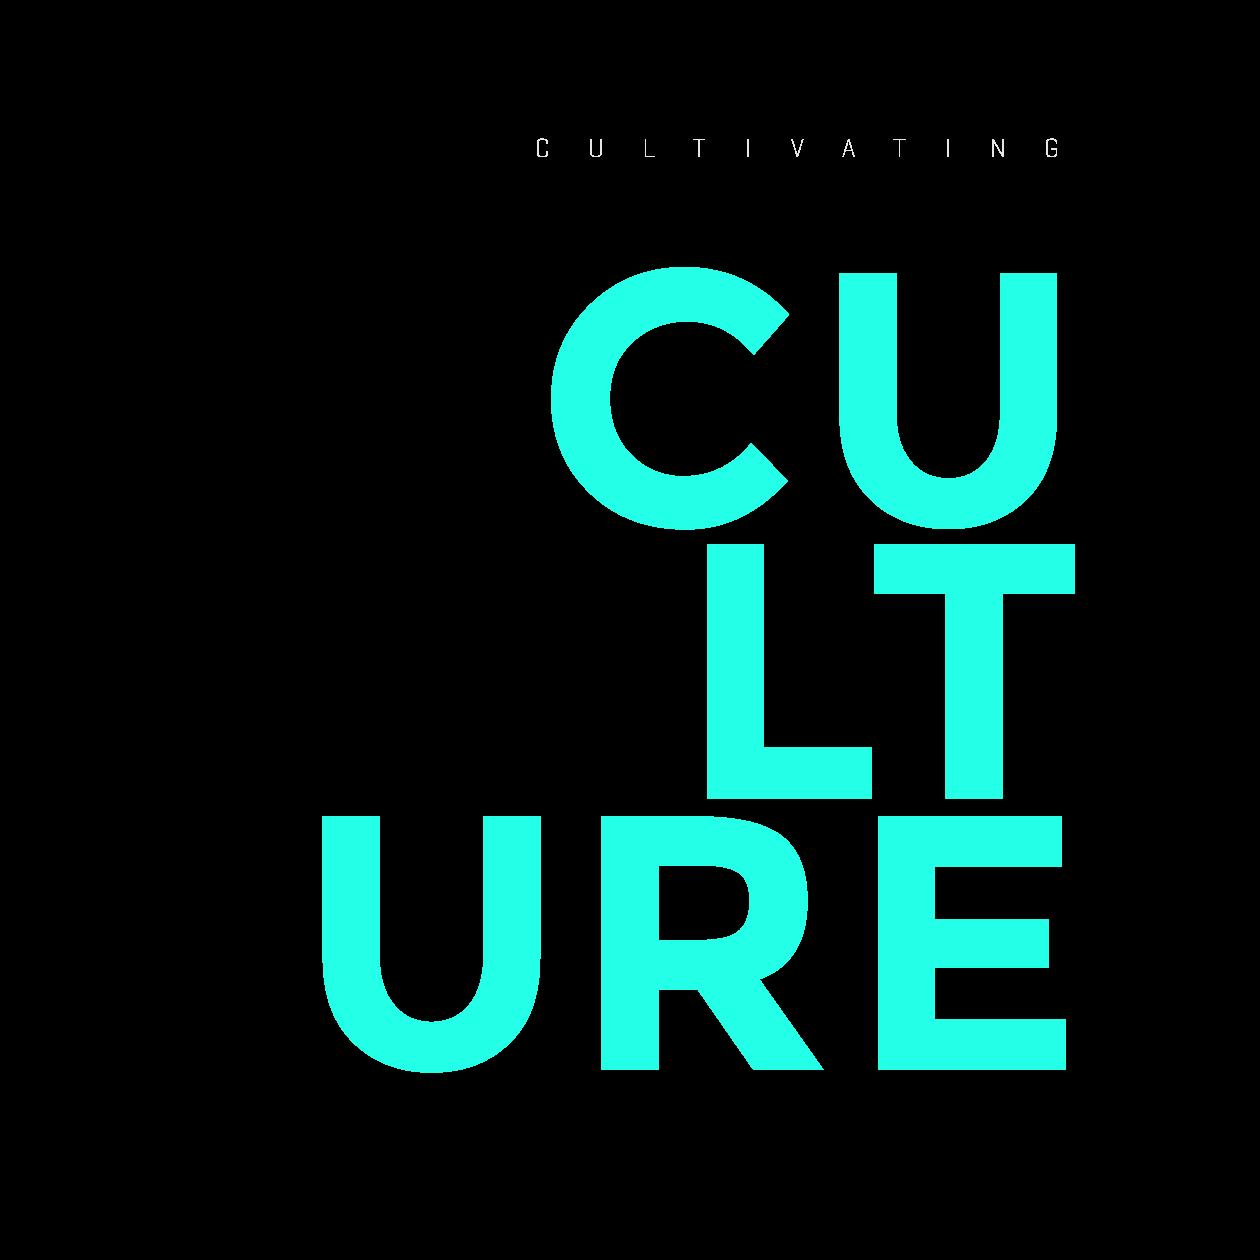 CultivatingCulture_Graphic_Transparent_1260_2.png